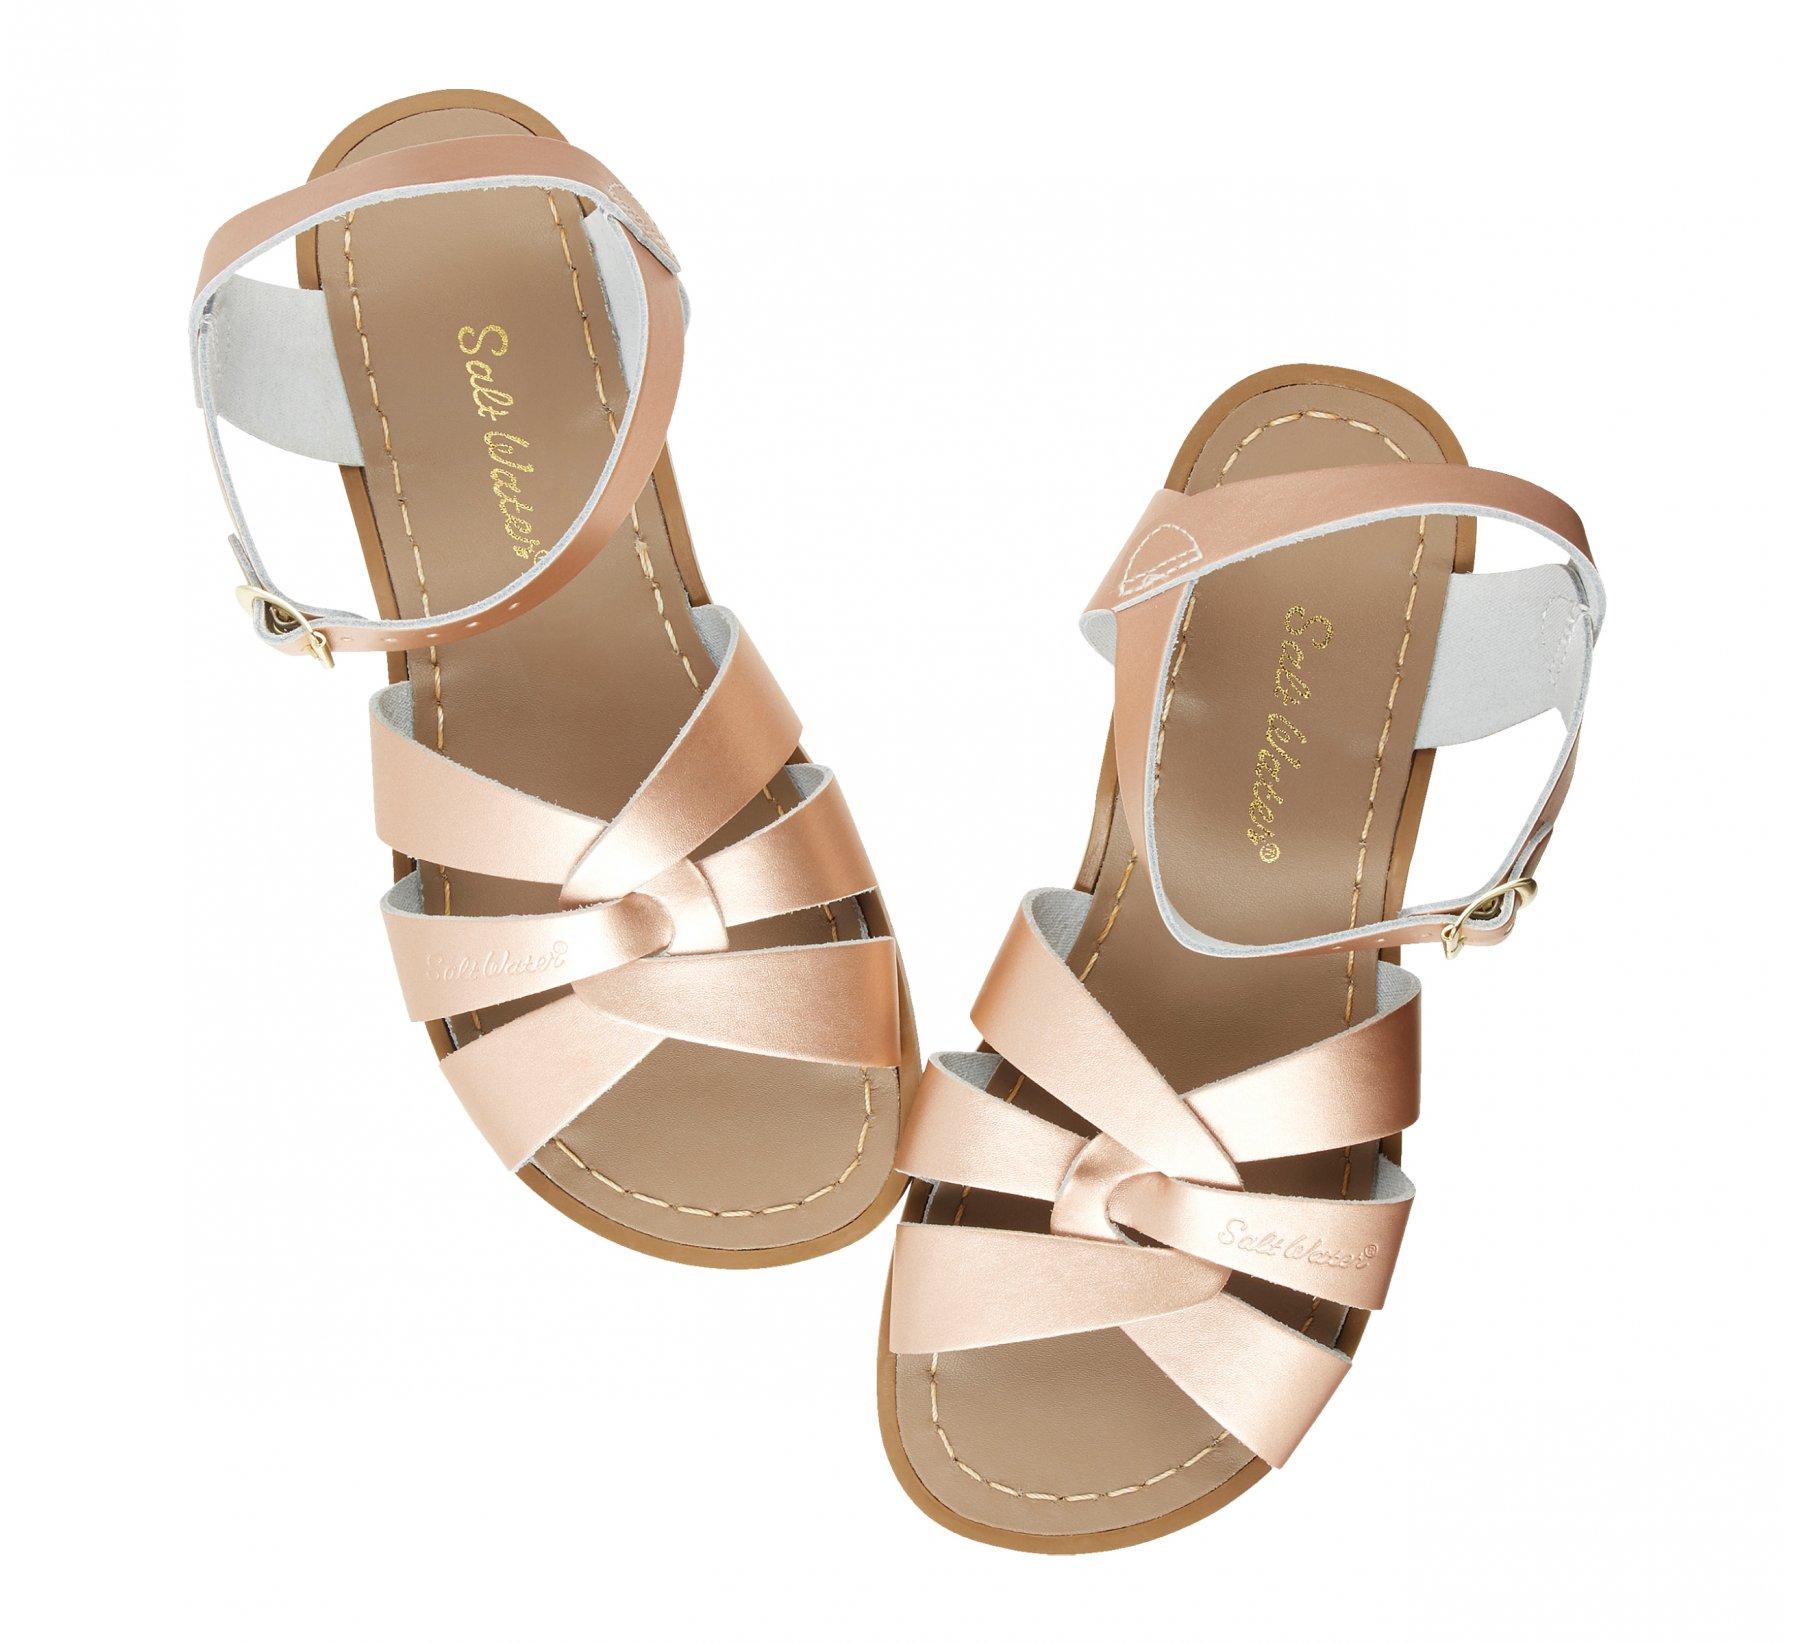 Original Rose Gold - Salt Water Sandals